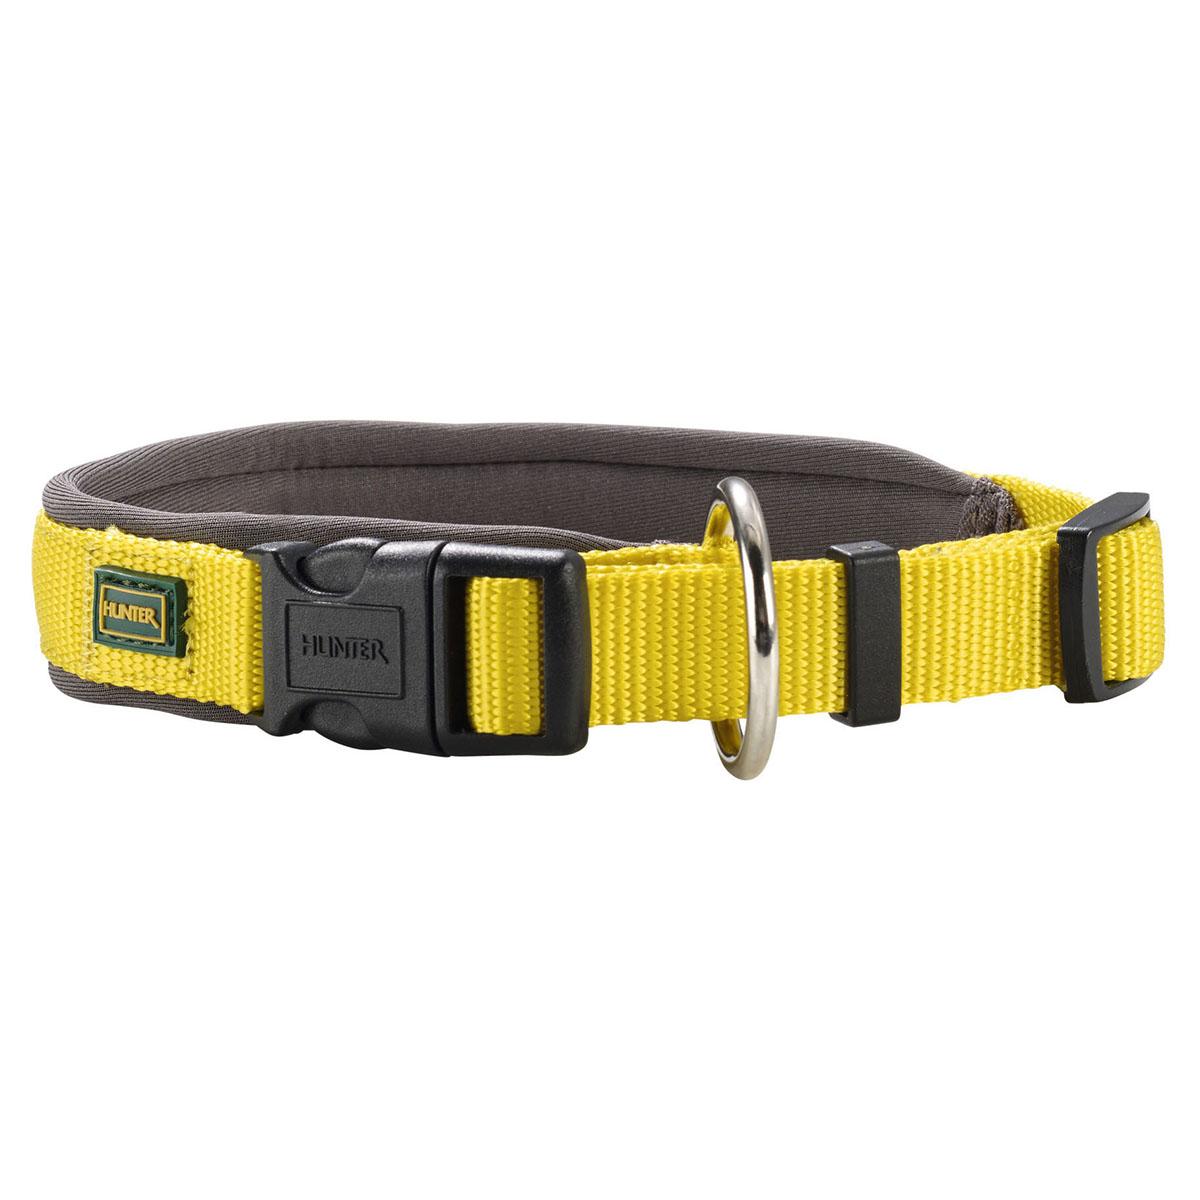 hunter halsband neopren vario plus gelb grau. Black Bedroom Furniture Sets. Home Design Ideas